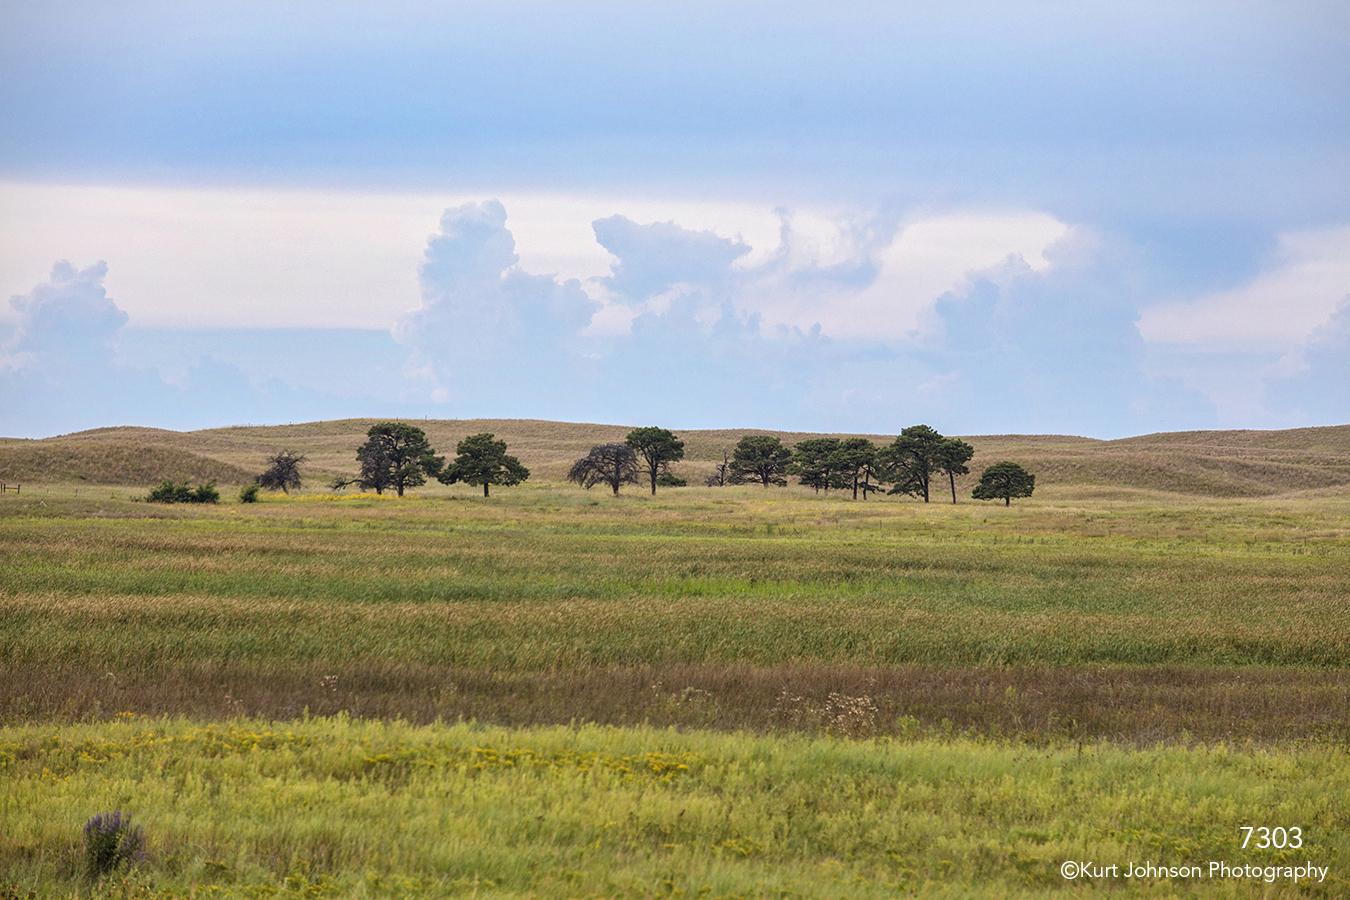 landscape grasses trees clouds